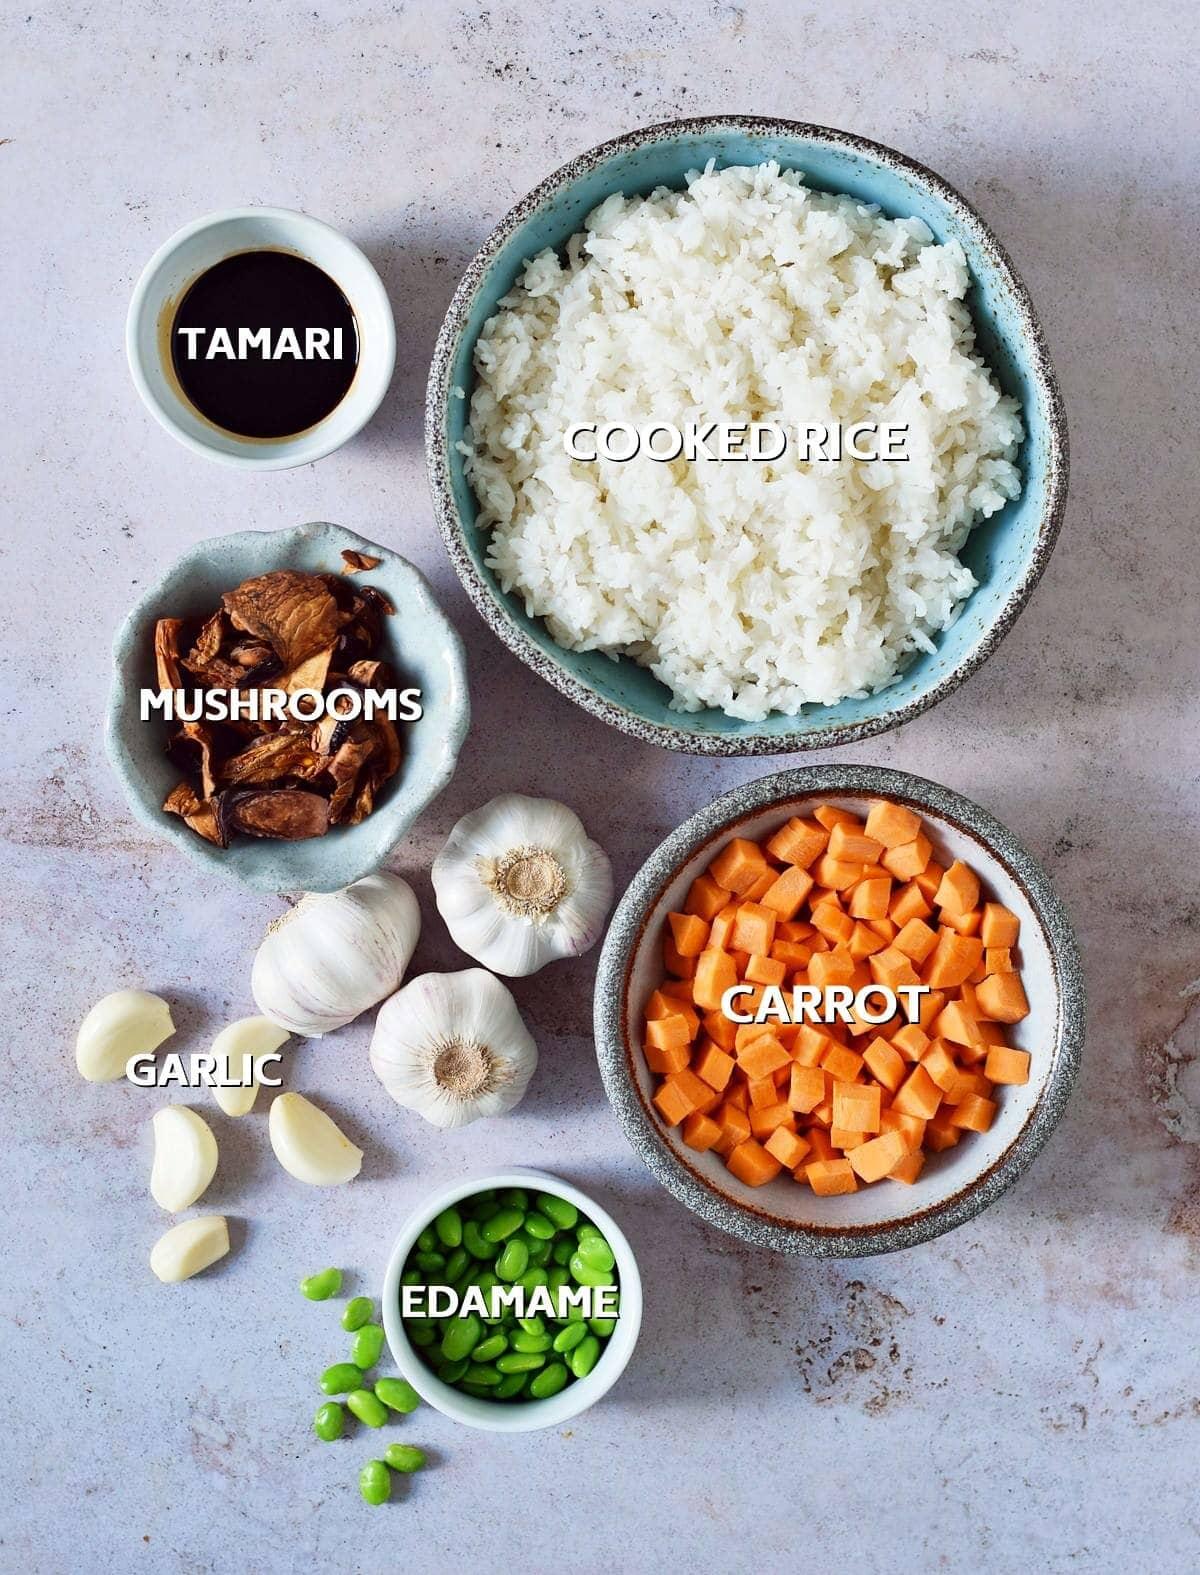 Ingredients for garlic fried rice